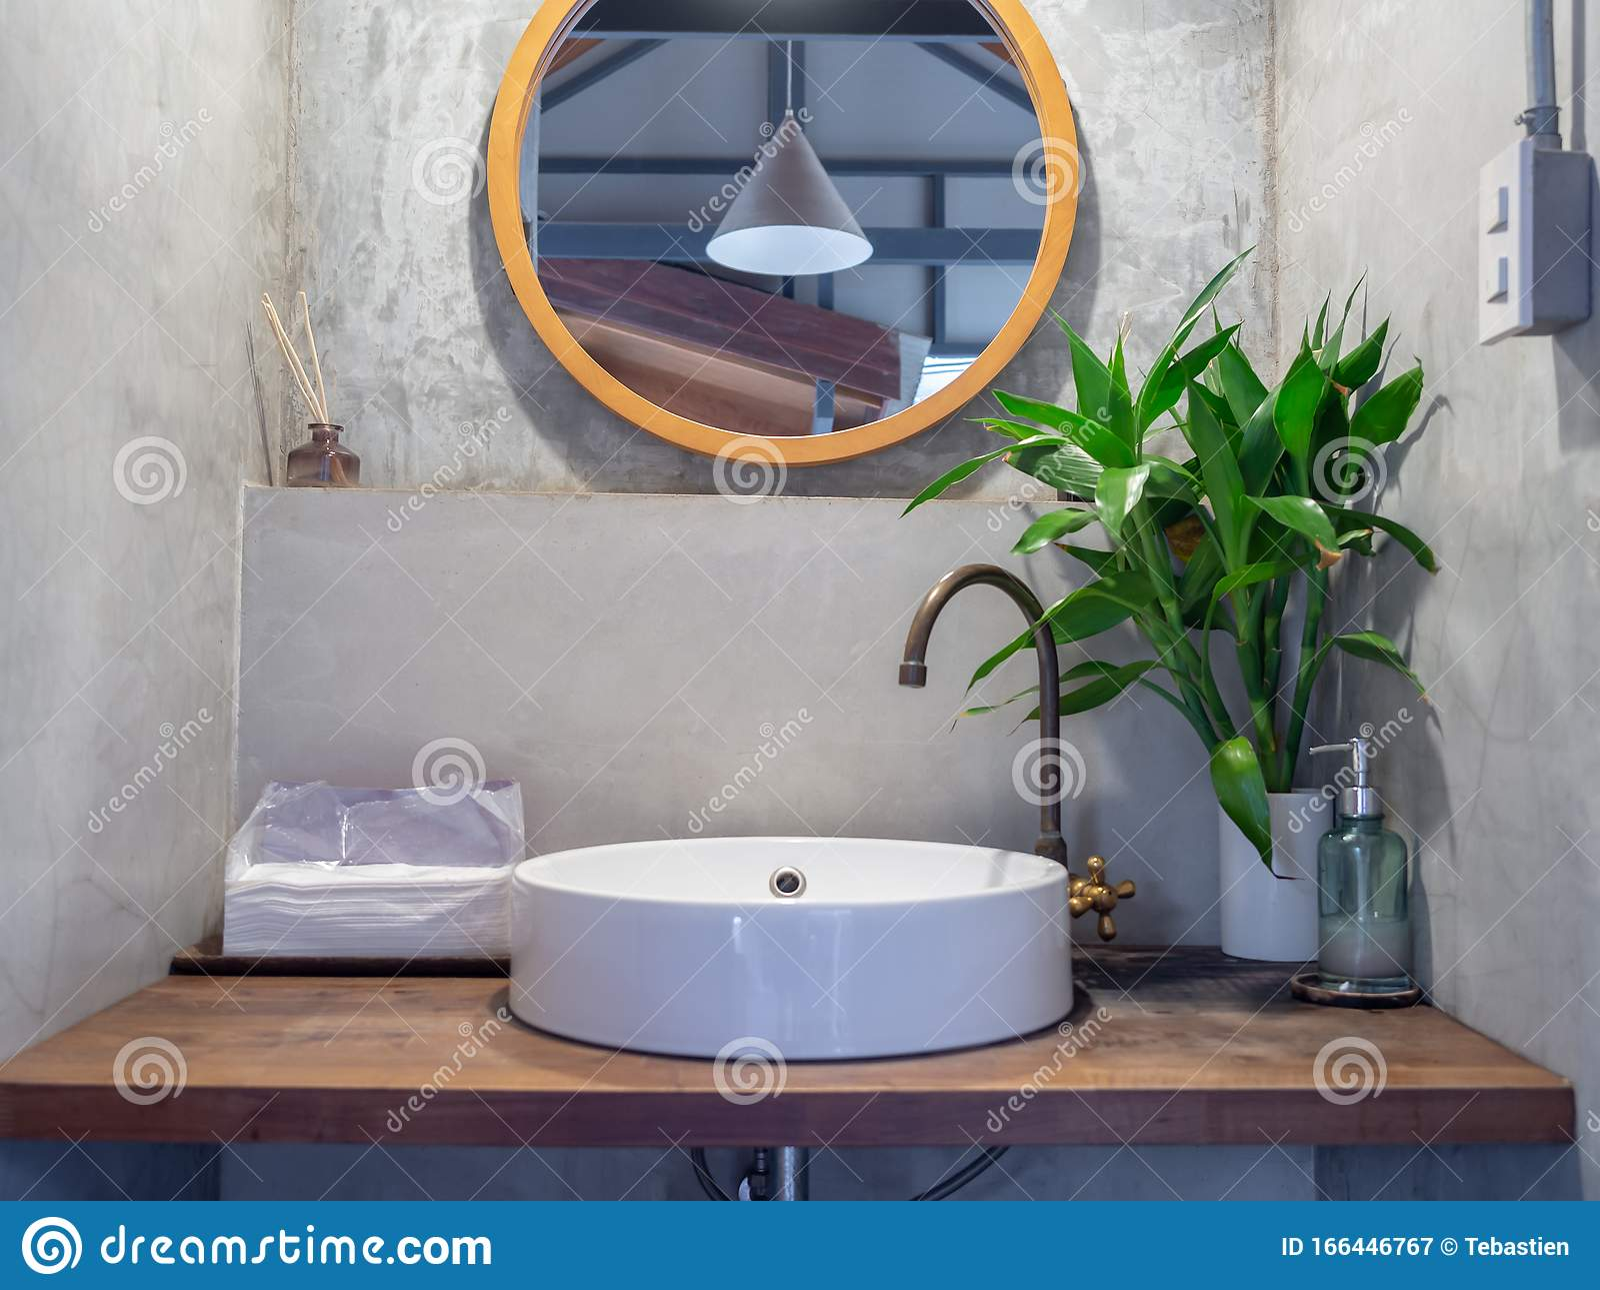 https www dreamstime com loft style bathroom interior round mirror concrete wall brass faucet white sink basin green leaves ceramic vase image166446767